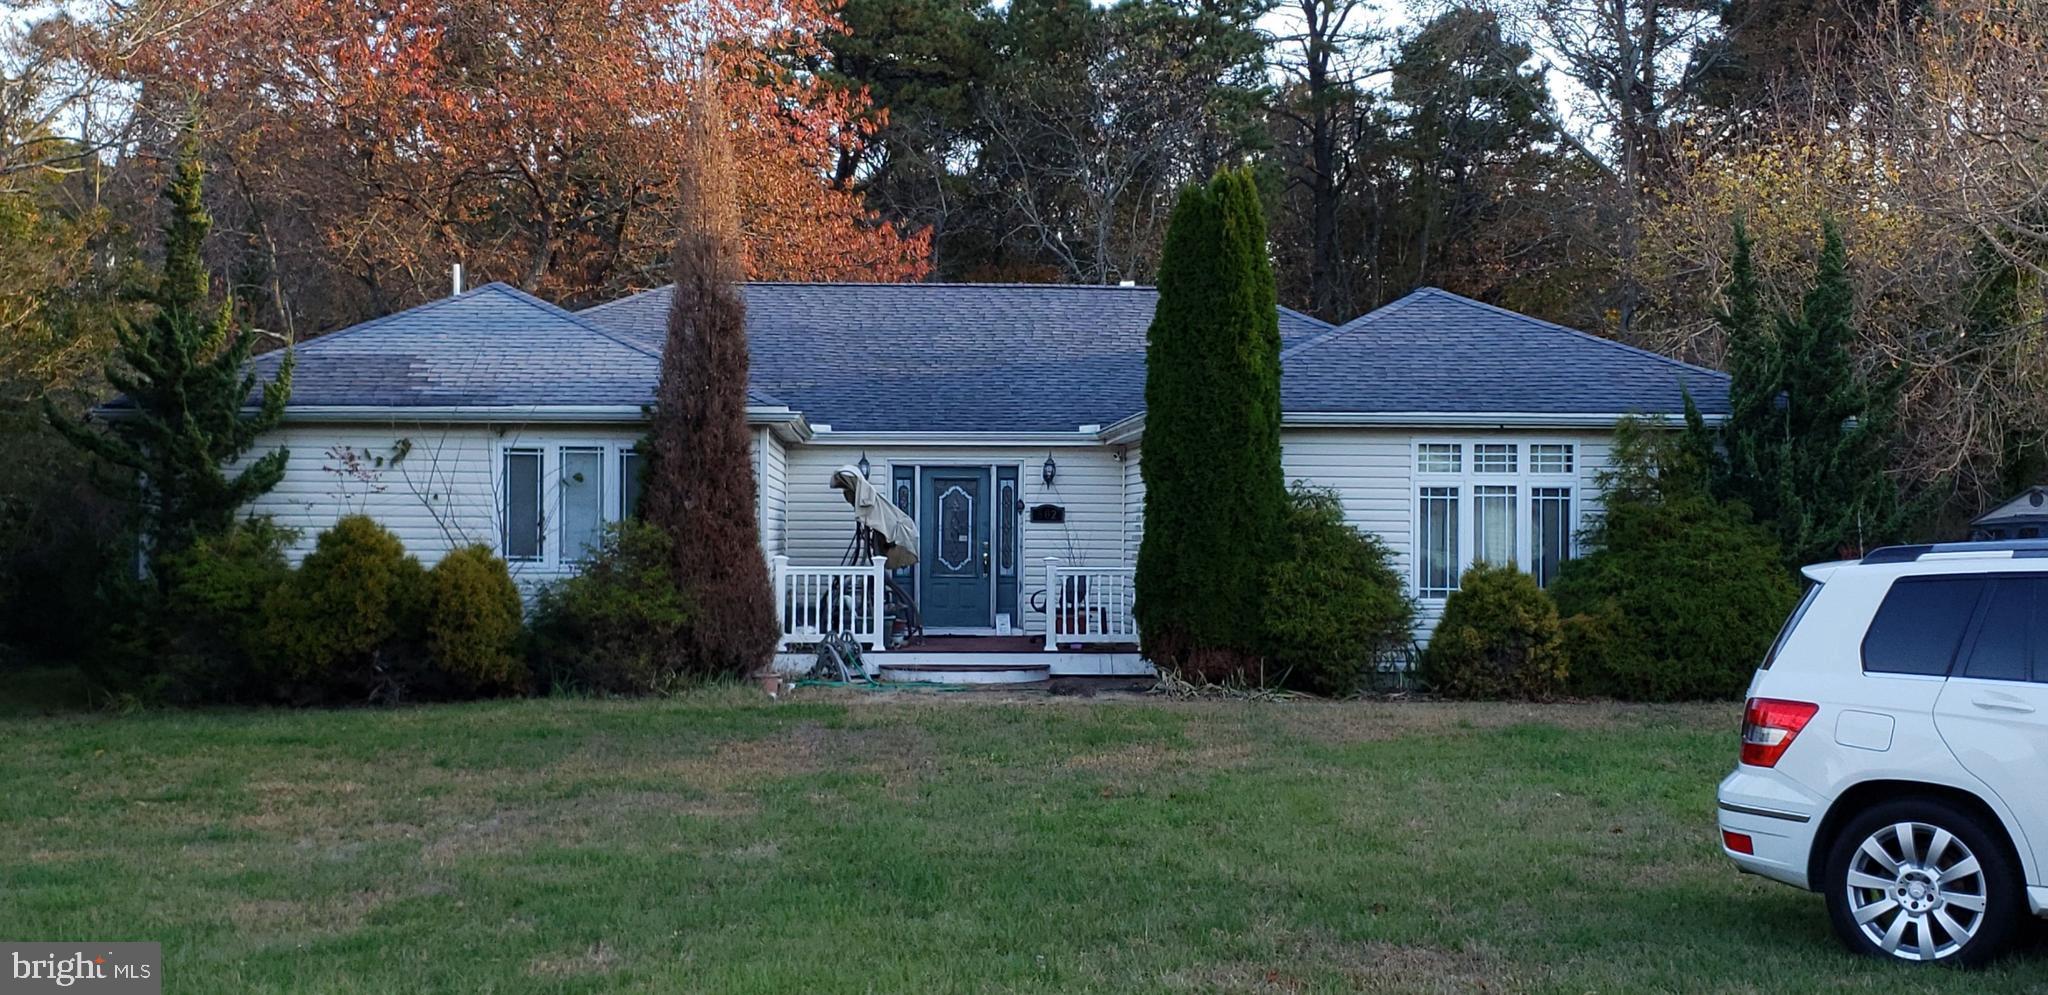 502 MAIN W, CAPE MAY COURT HOUSE, NJ 08210